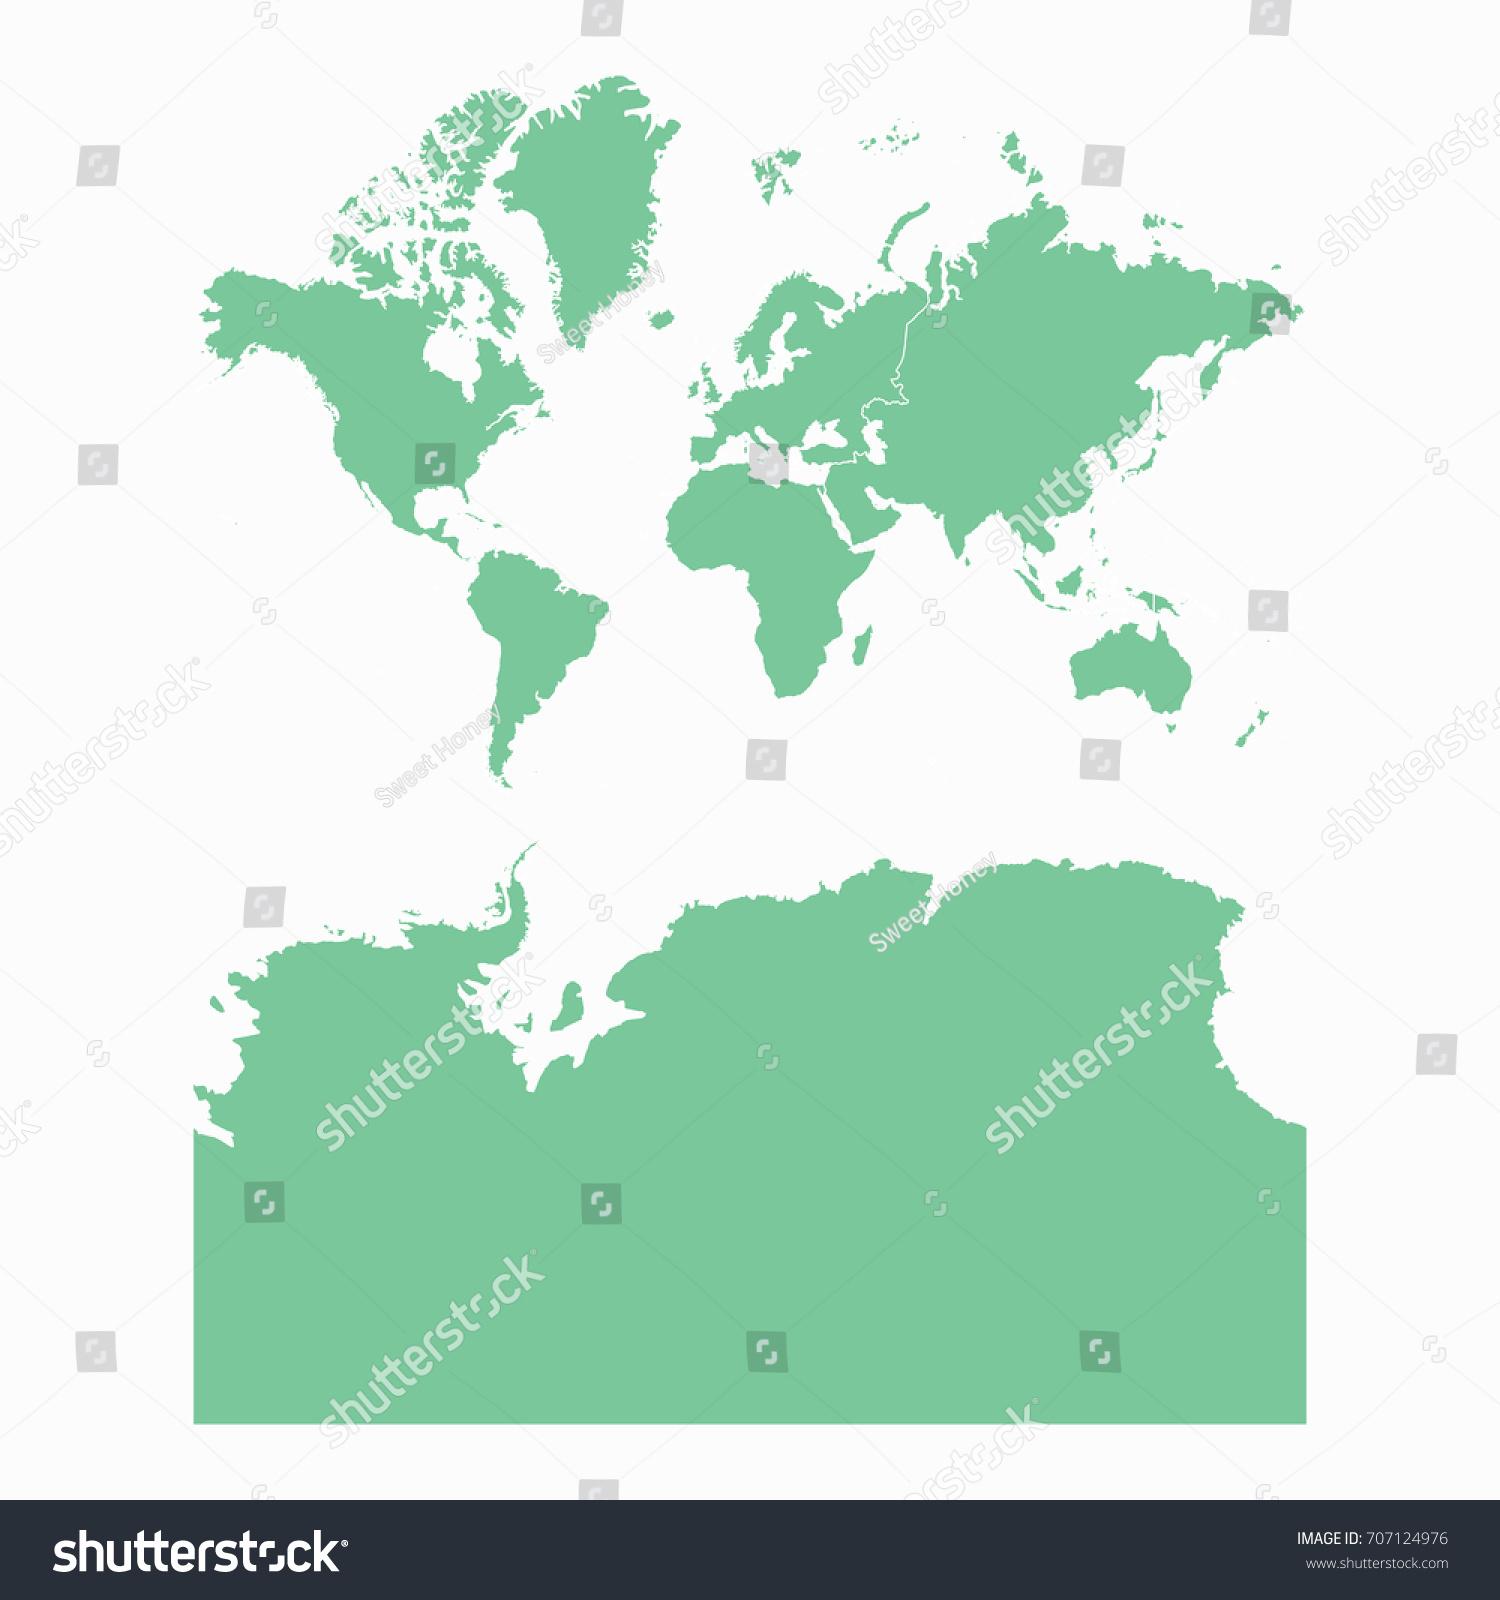 Mapcontinents Antarctica Map Each City Border Stock Vector - Antarctica physical map cities